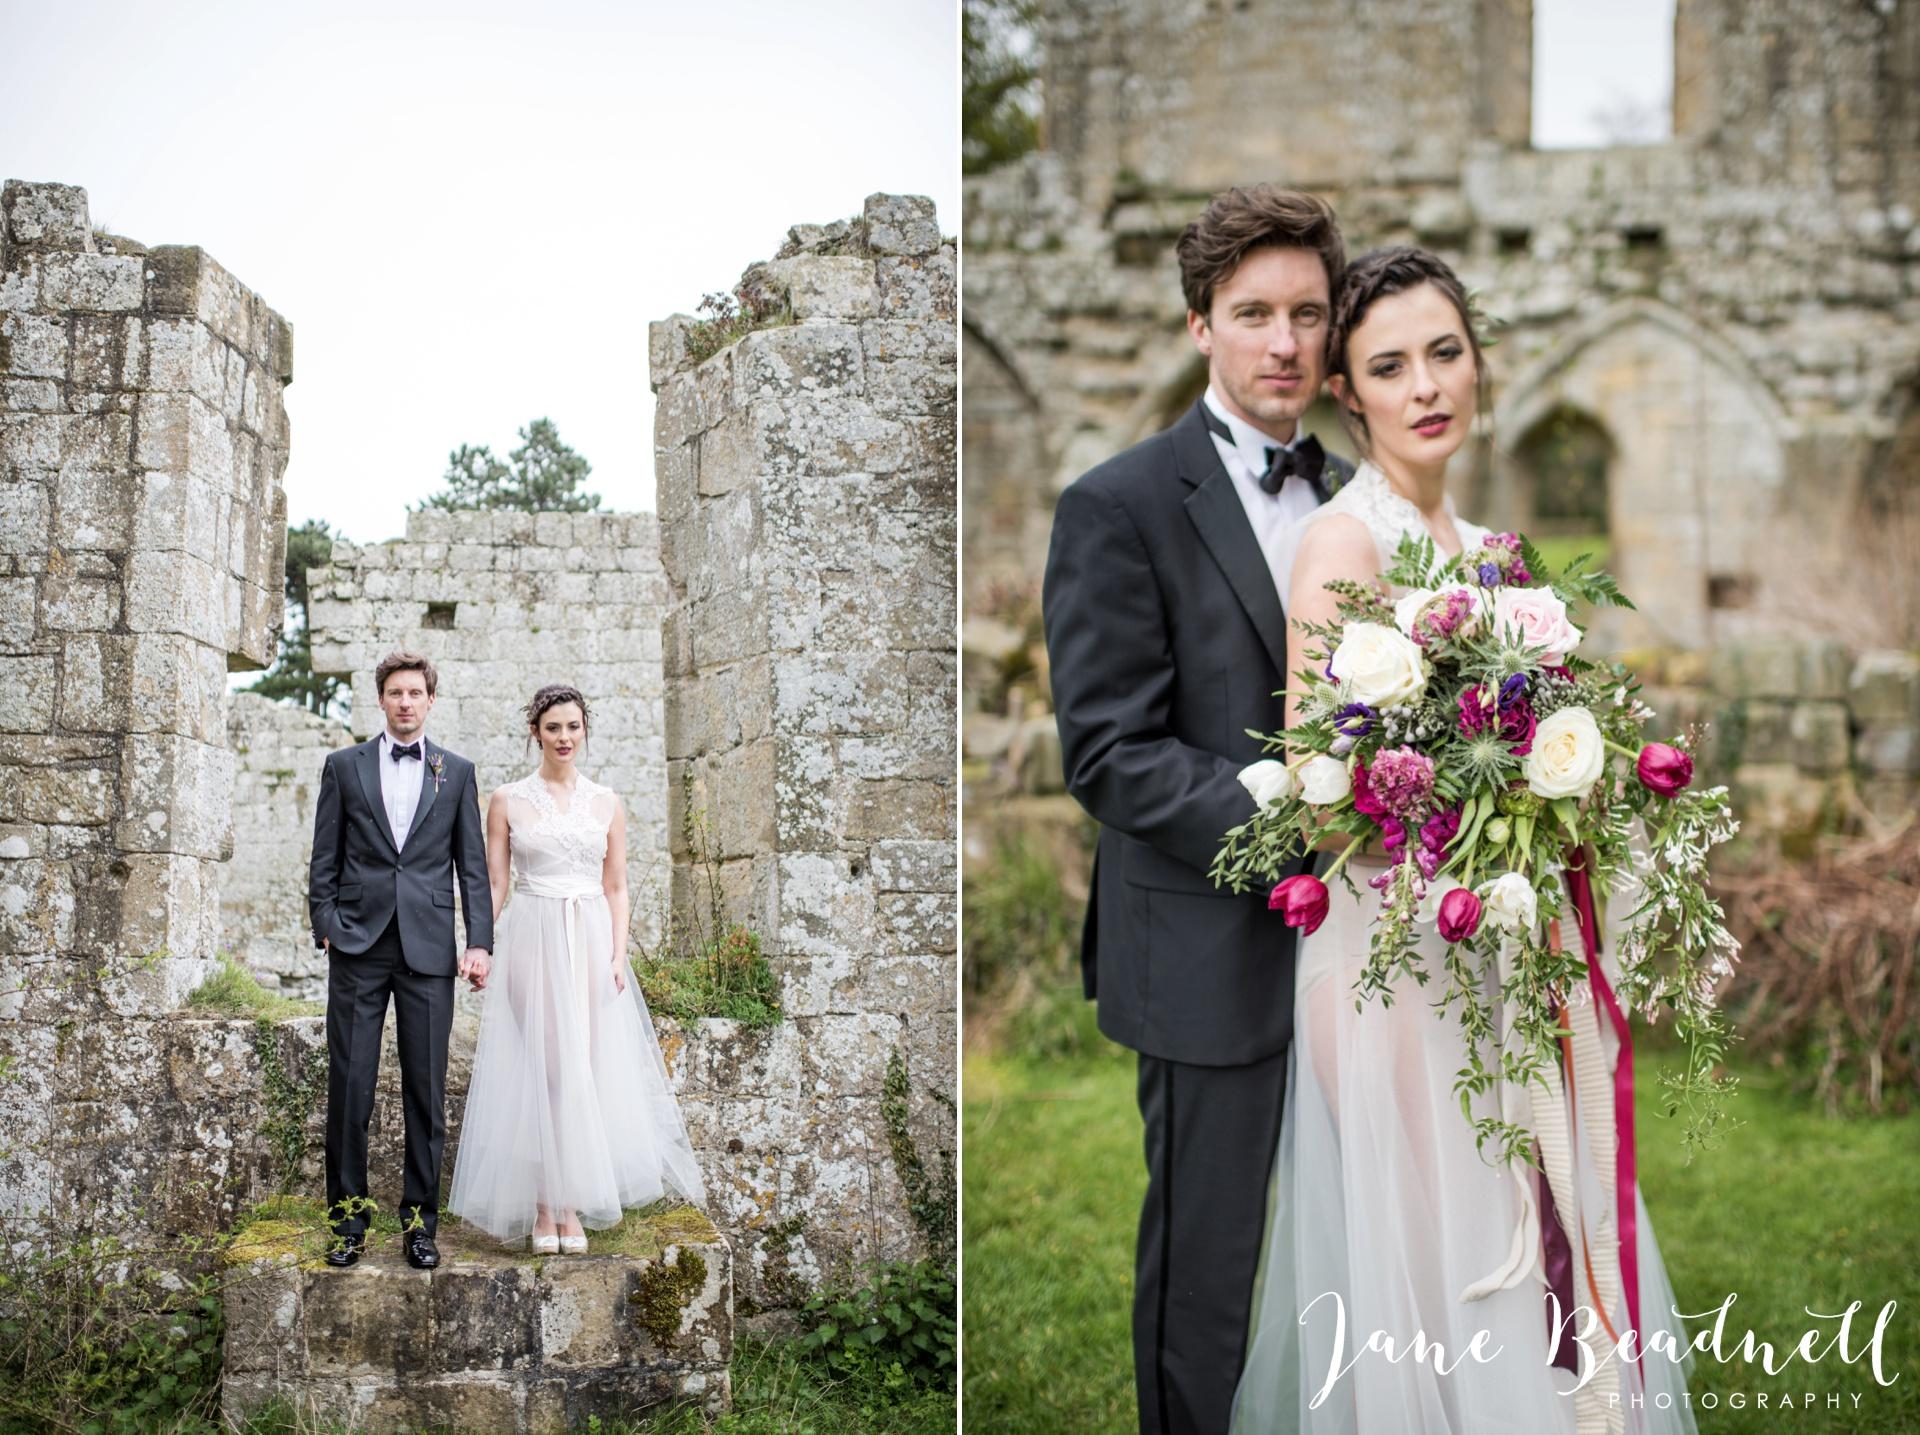 Jervaulx Abbey wedding photography fine art Yorkshire wedding photographer jane beadnell_0036